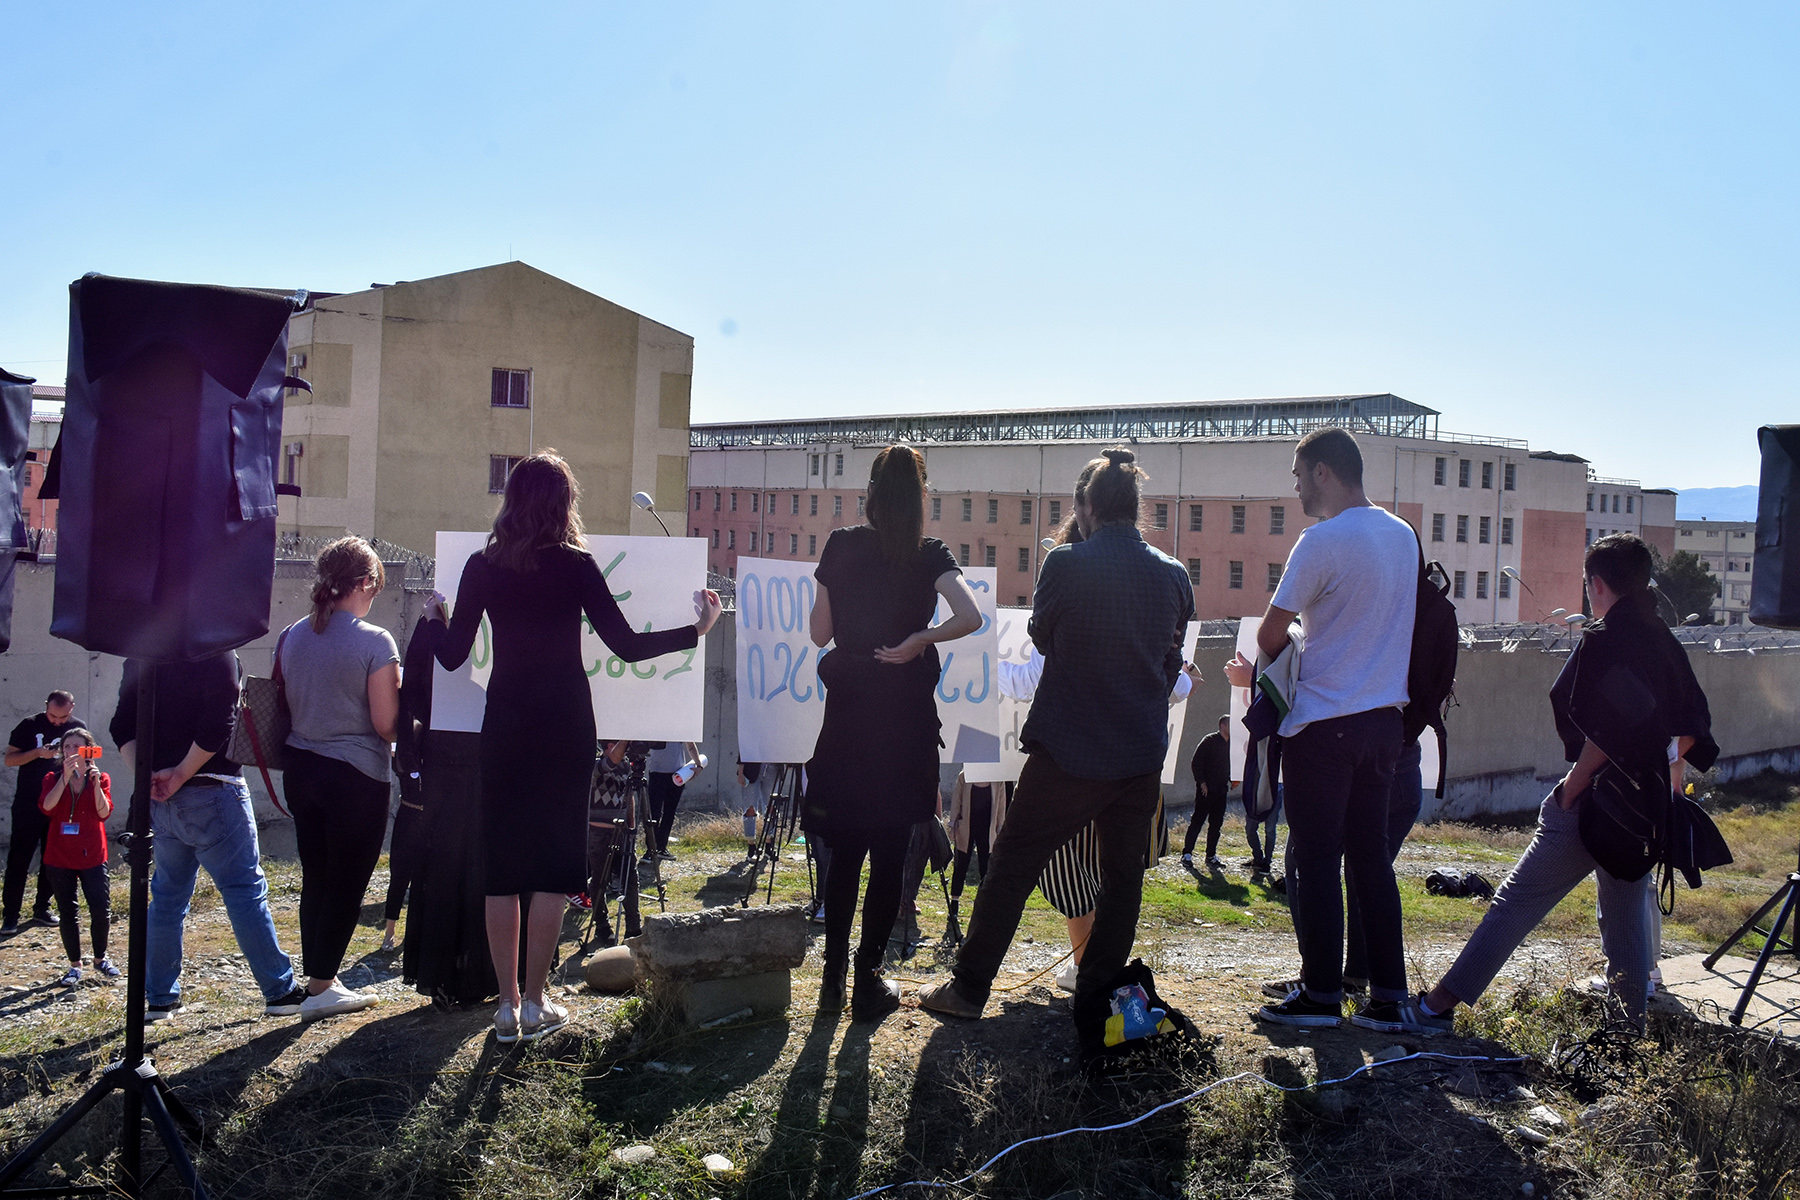 Gldani prison